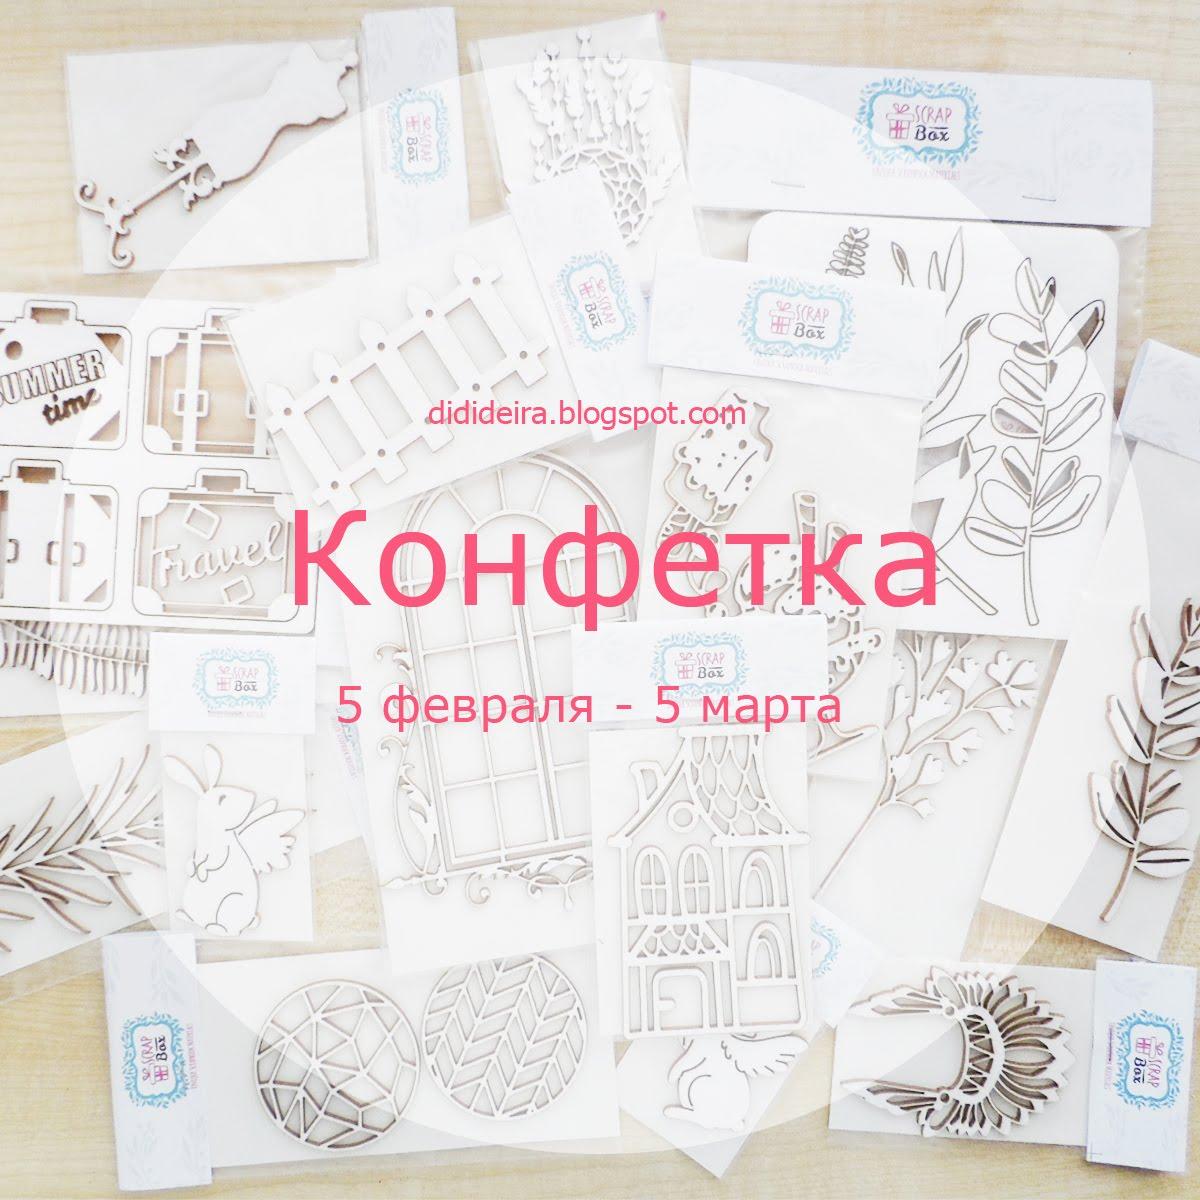 Конфетка от Натальи (Didideira) и ScrapBox